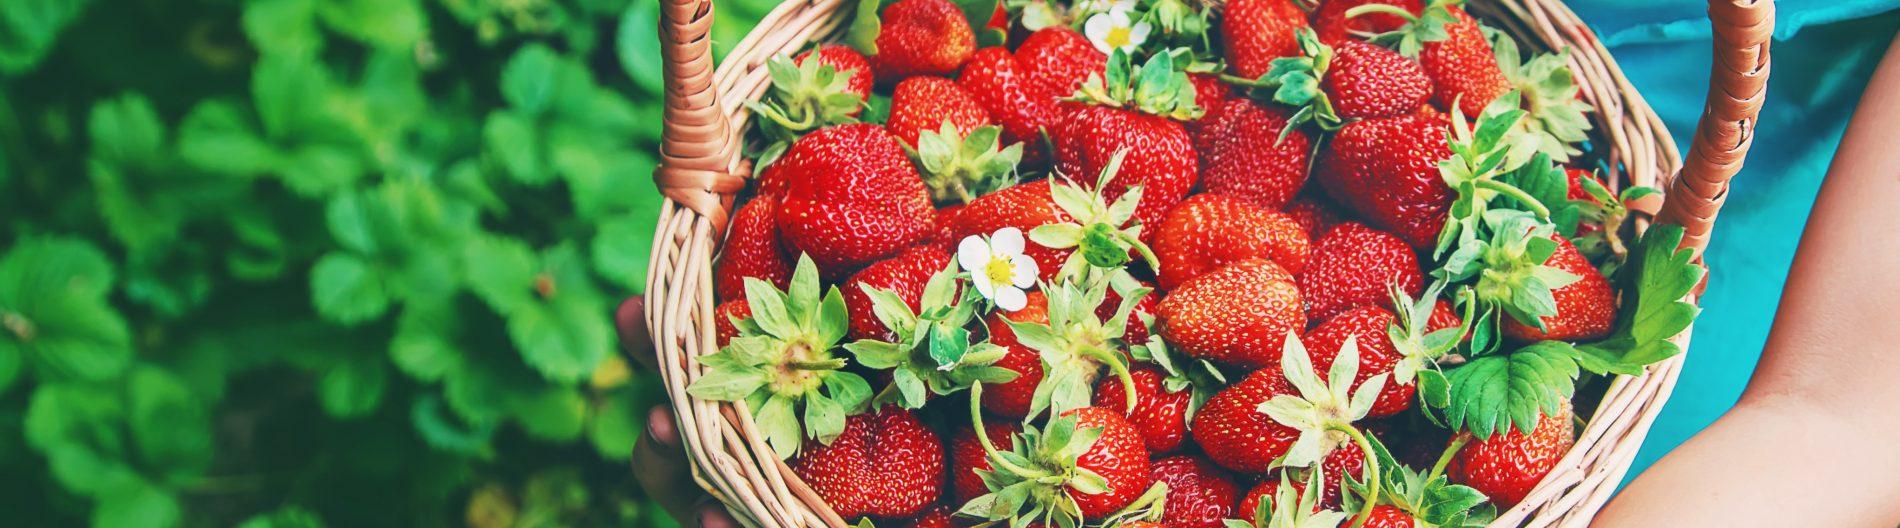 fresas: botánica